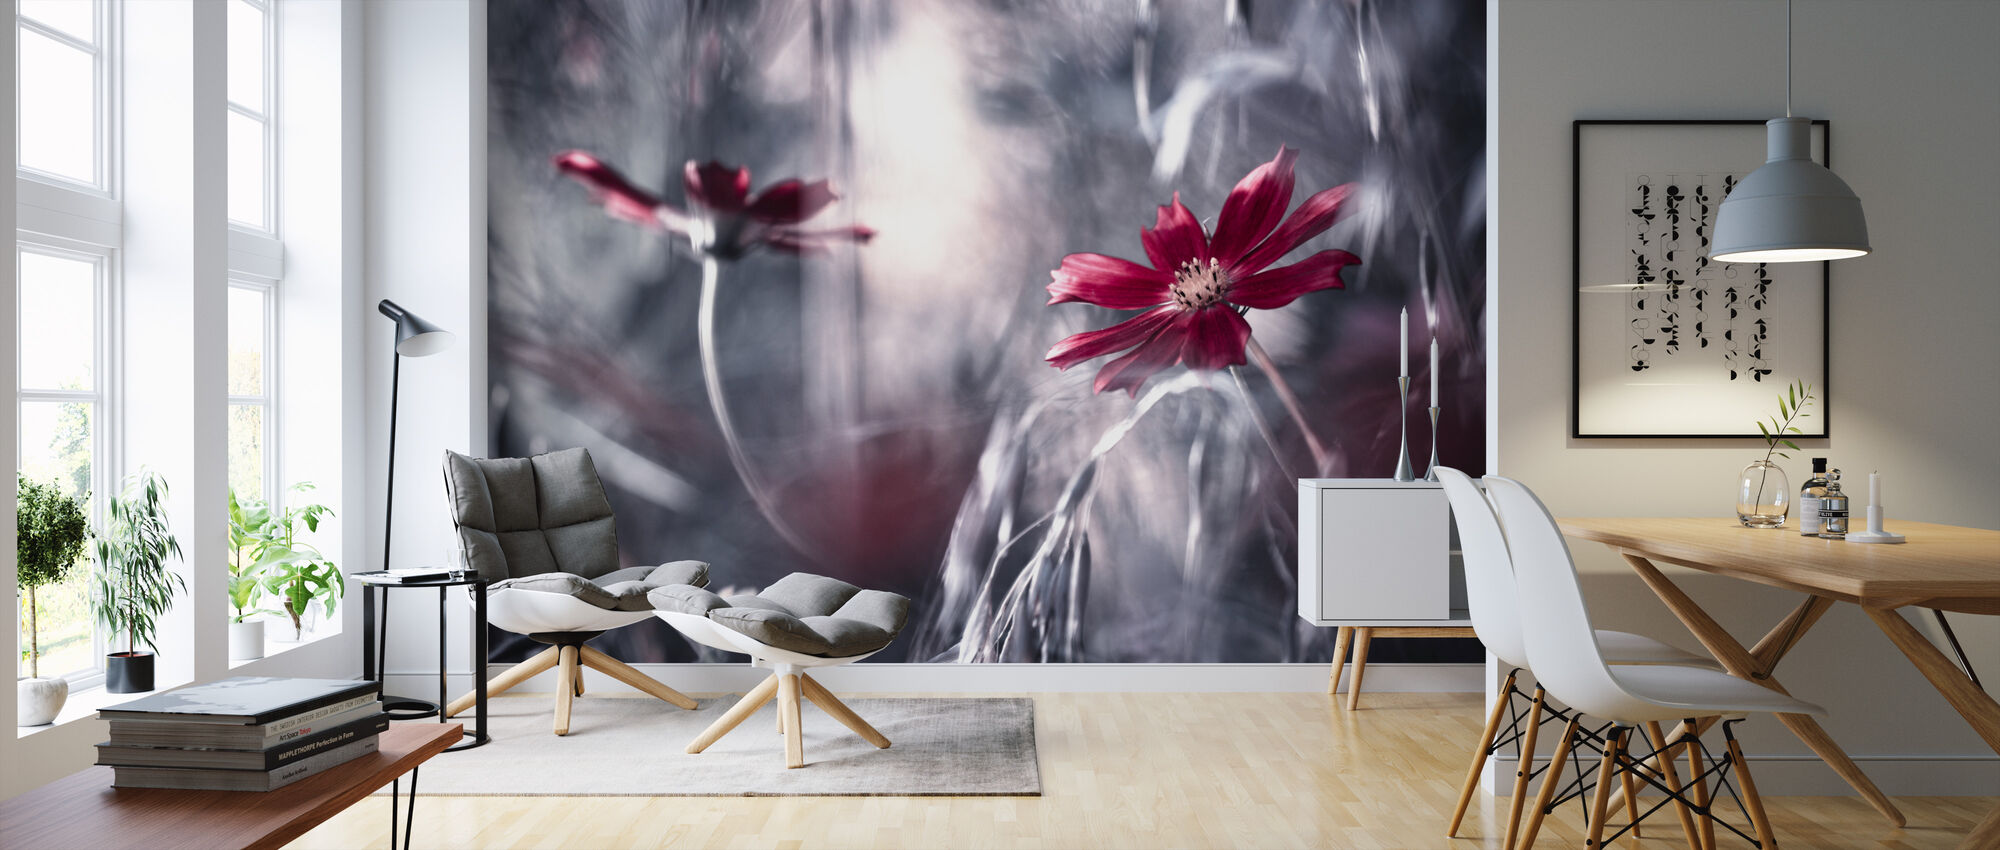 Seduction Games - Wallpaper - Living Room